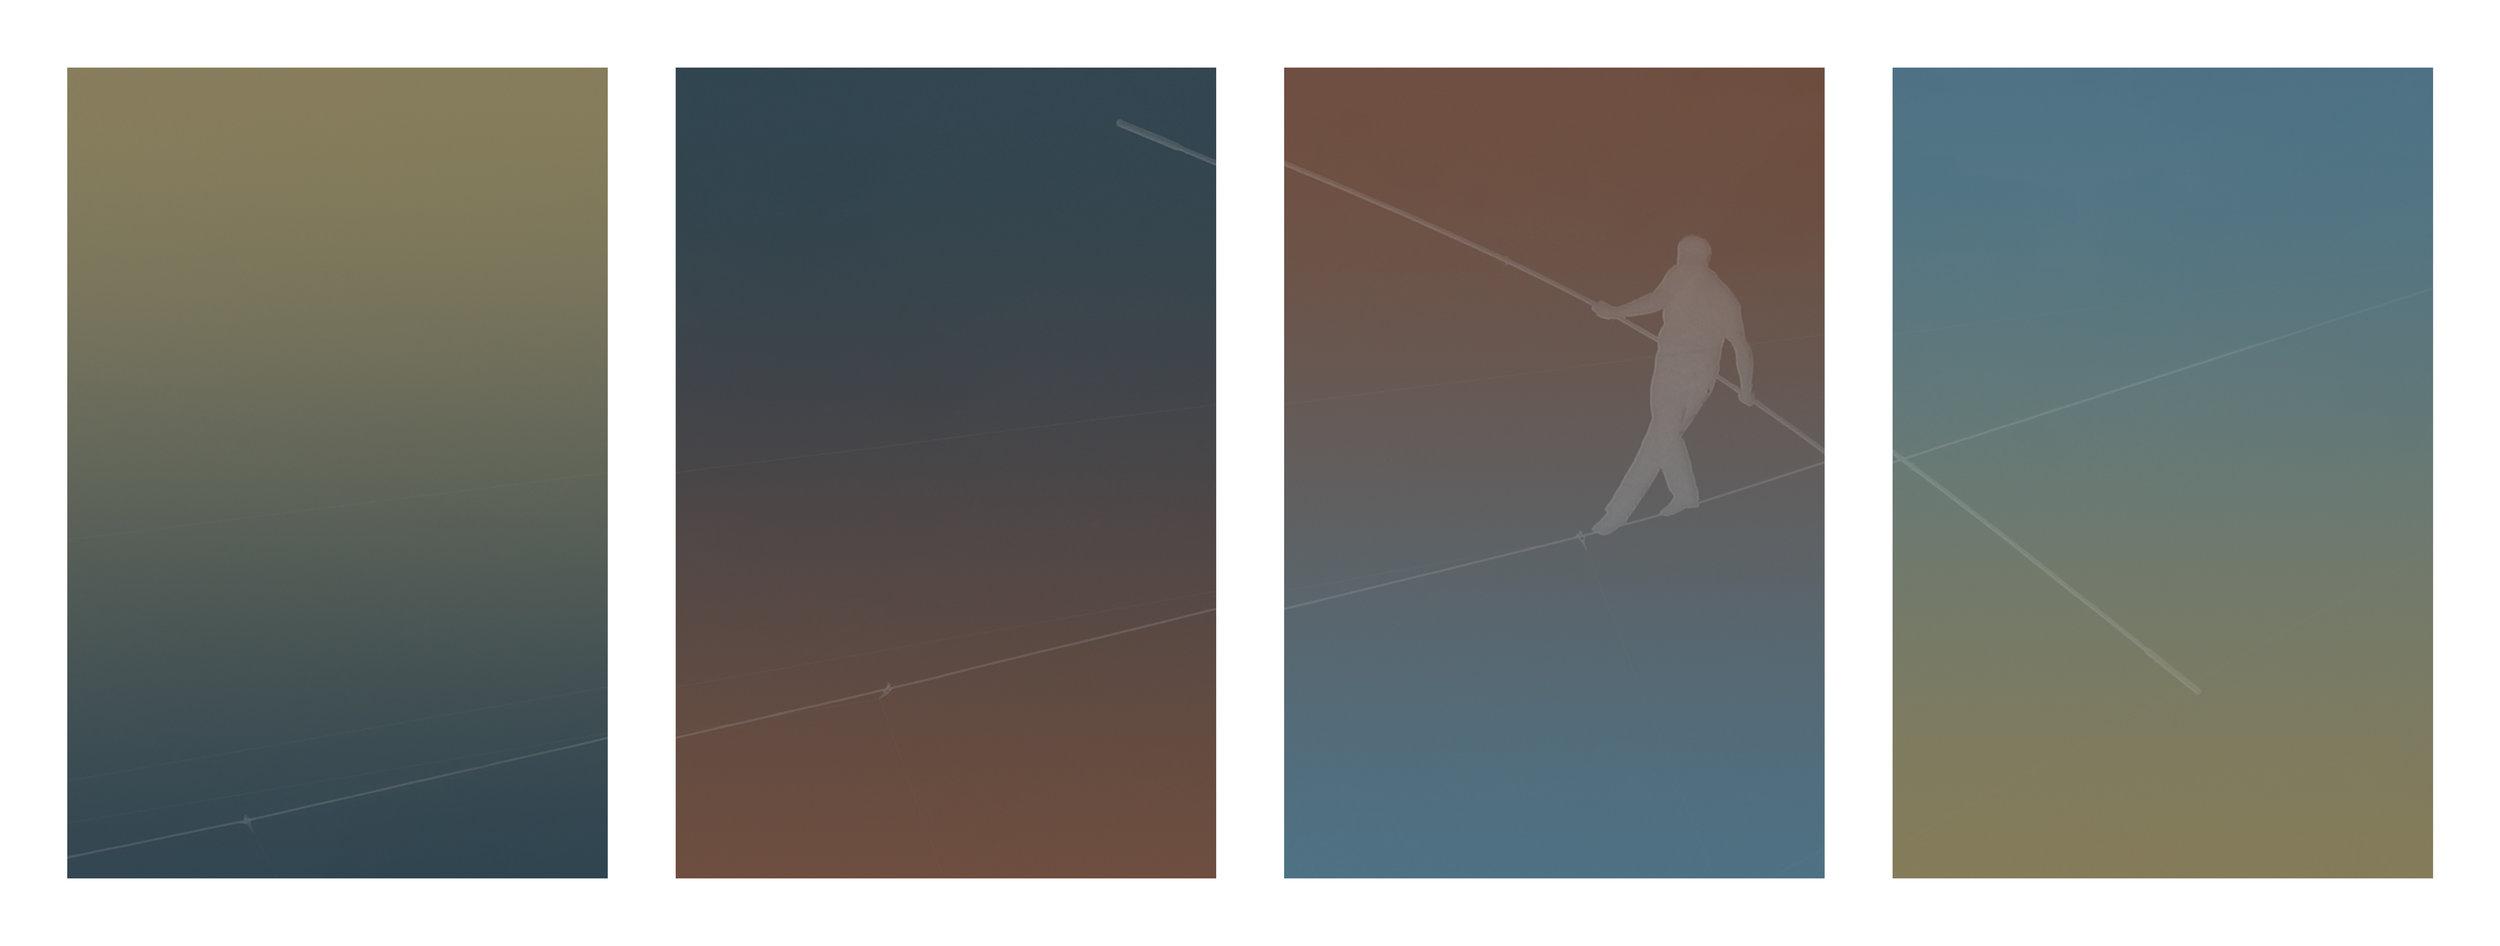 tightrope walker four up 2.jpg